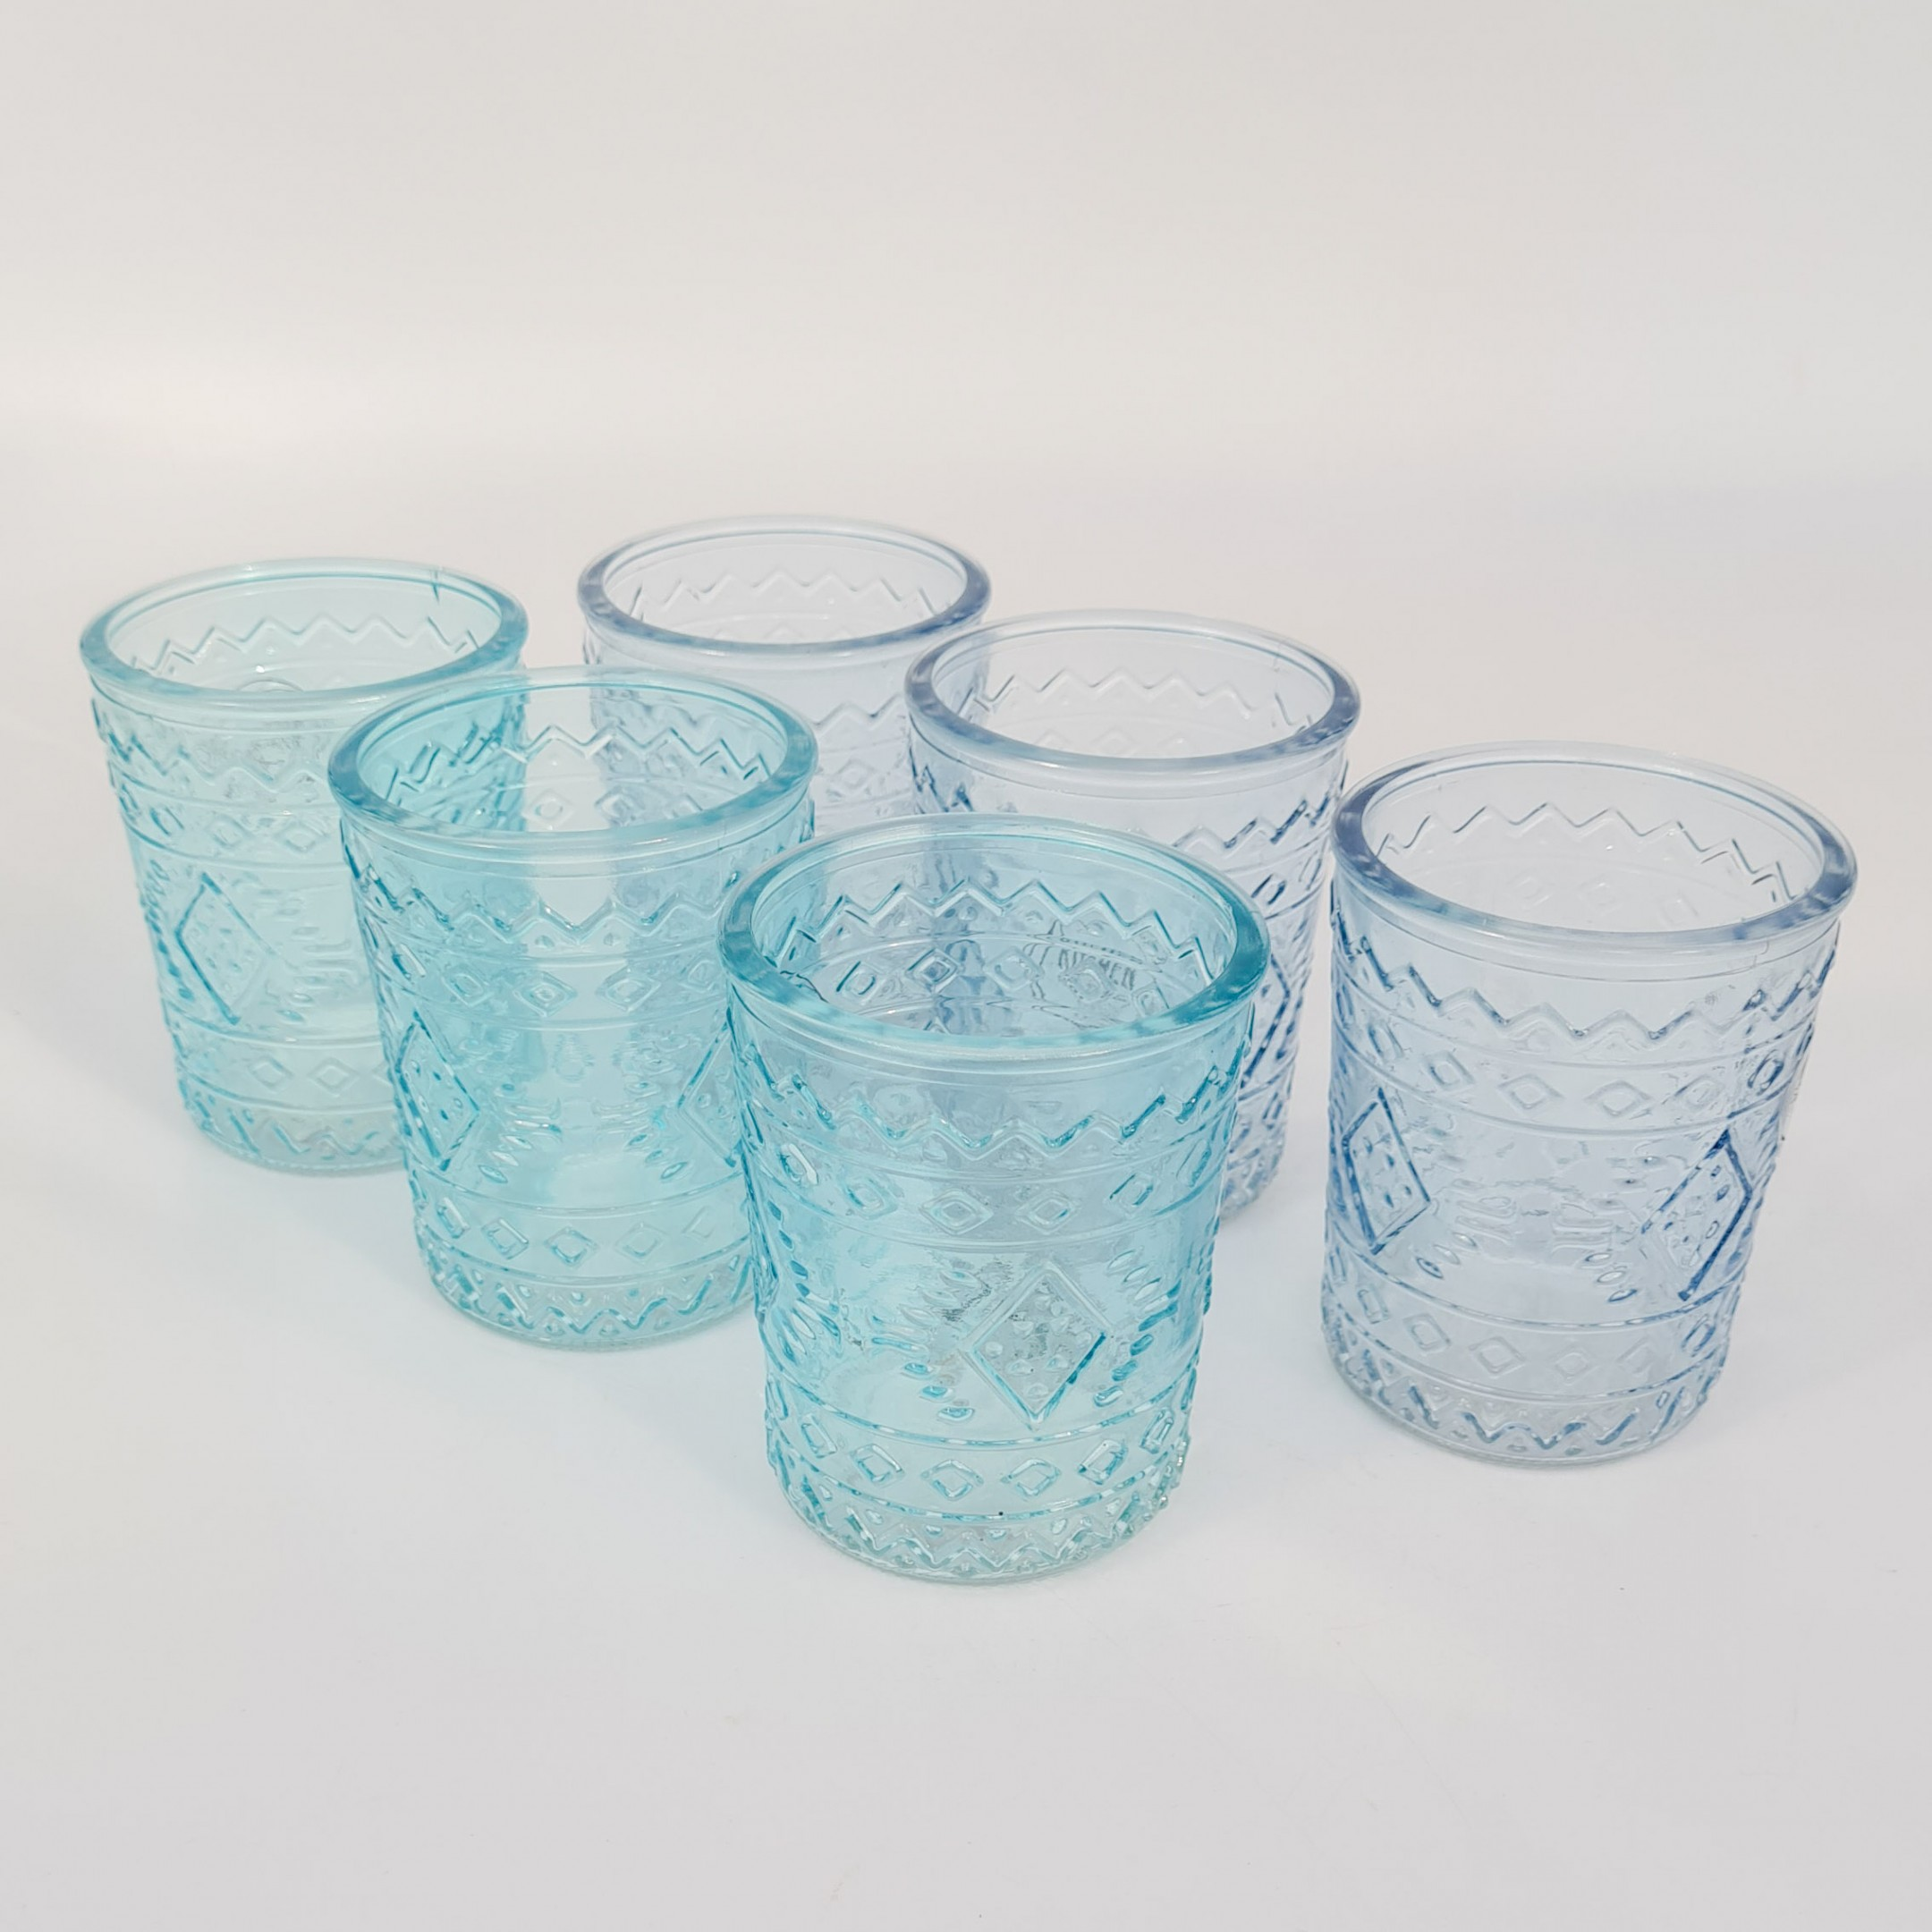 "Trinkglas 6er Set ""Mare"" Bild 1"